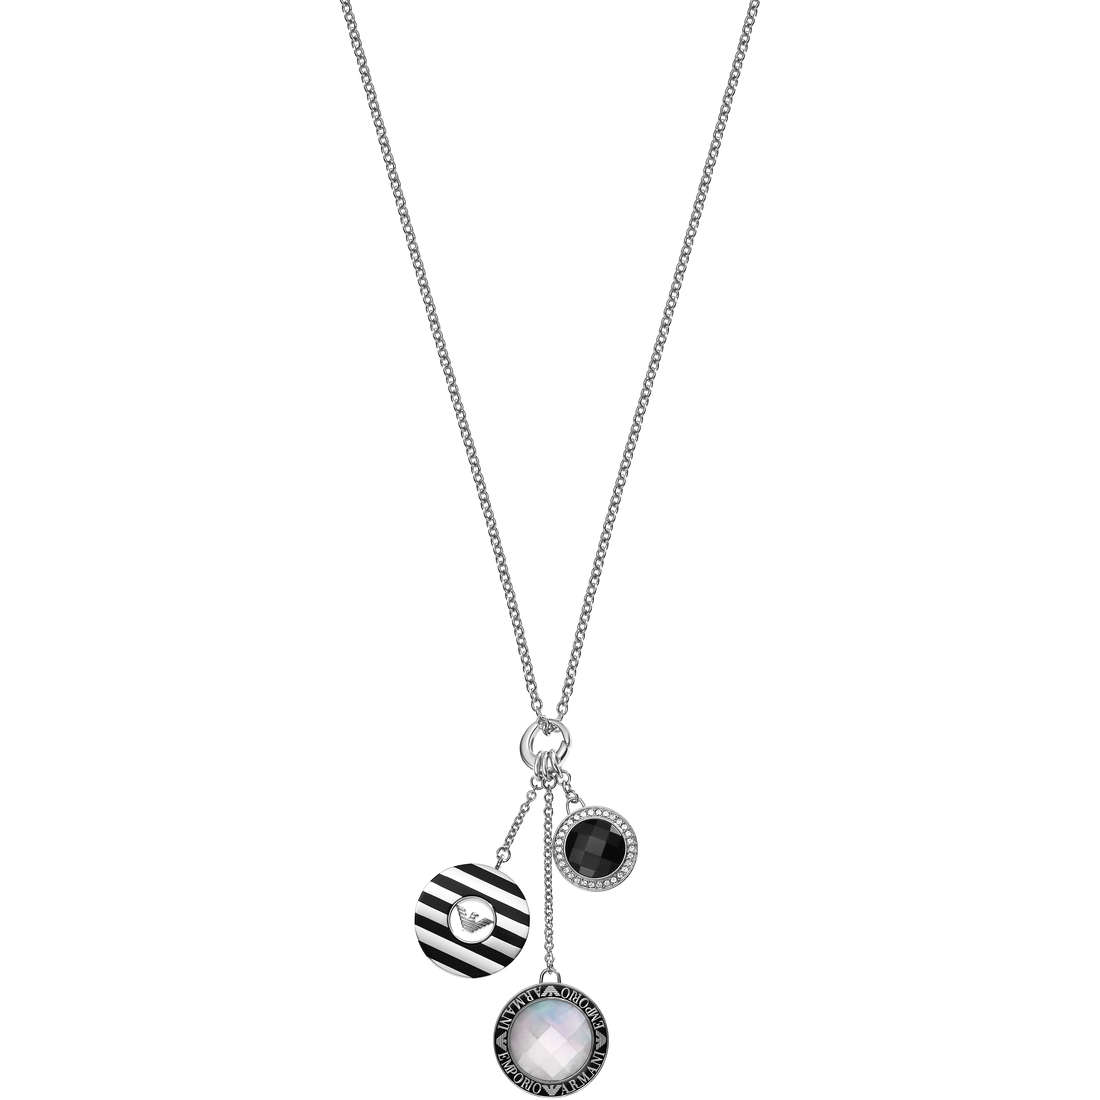 necklace woman jewellery Emporio Armani EGS1715040